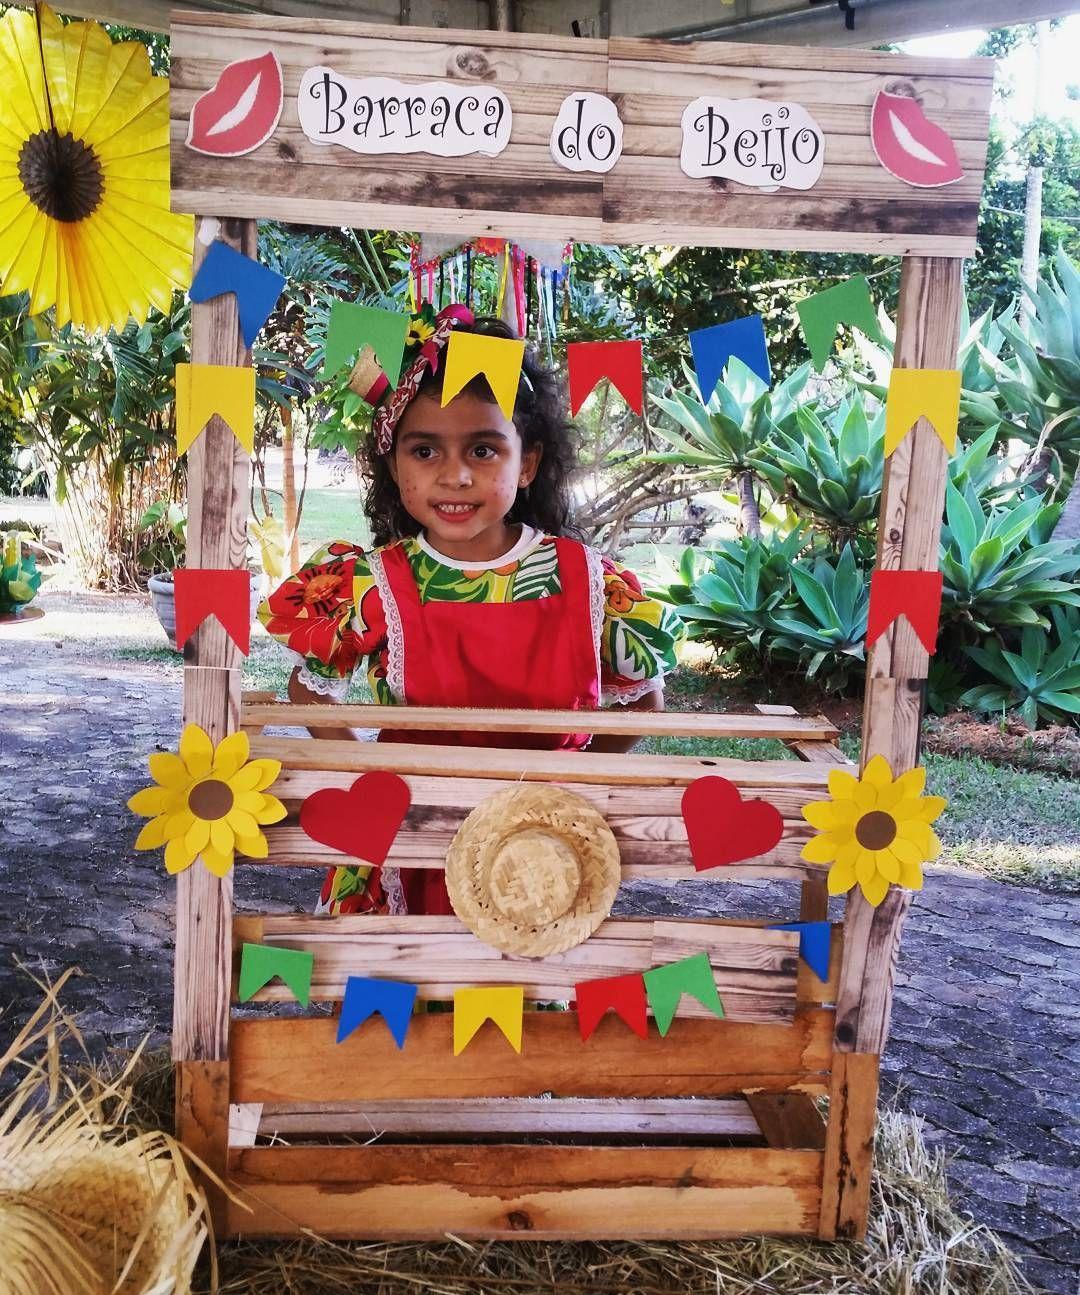 Festa Julina - Sara e Benjamim - Parkway #festajulina#festajunina#festacaipira#festajuninadf#decoracaojunina#Pecaslocacaodf#festadf#festabrasilia#atelierfestdecor#deboralopes#